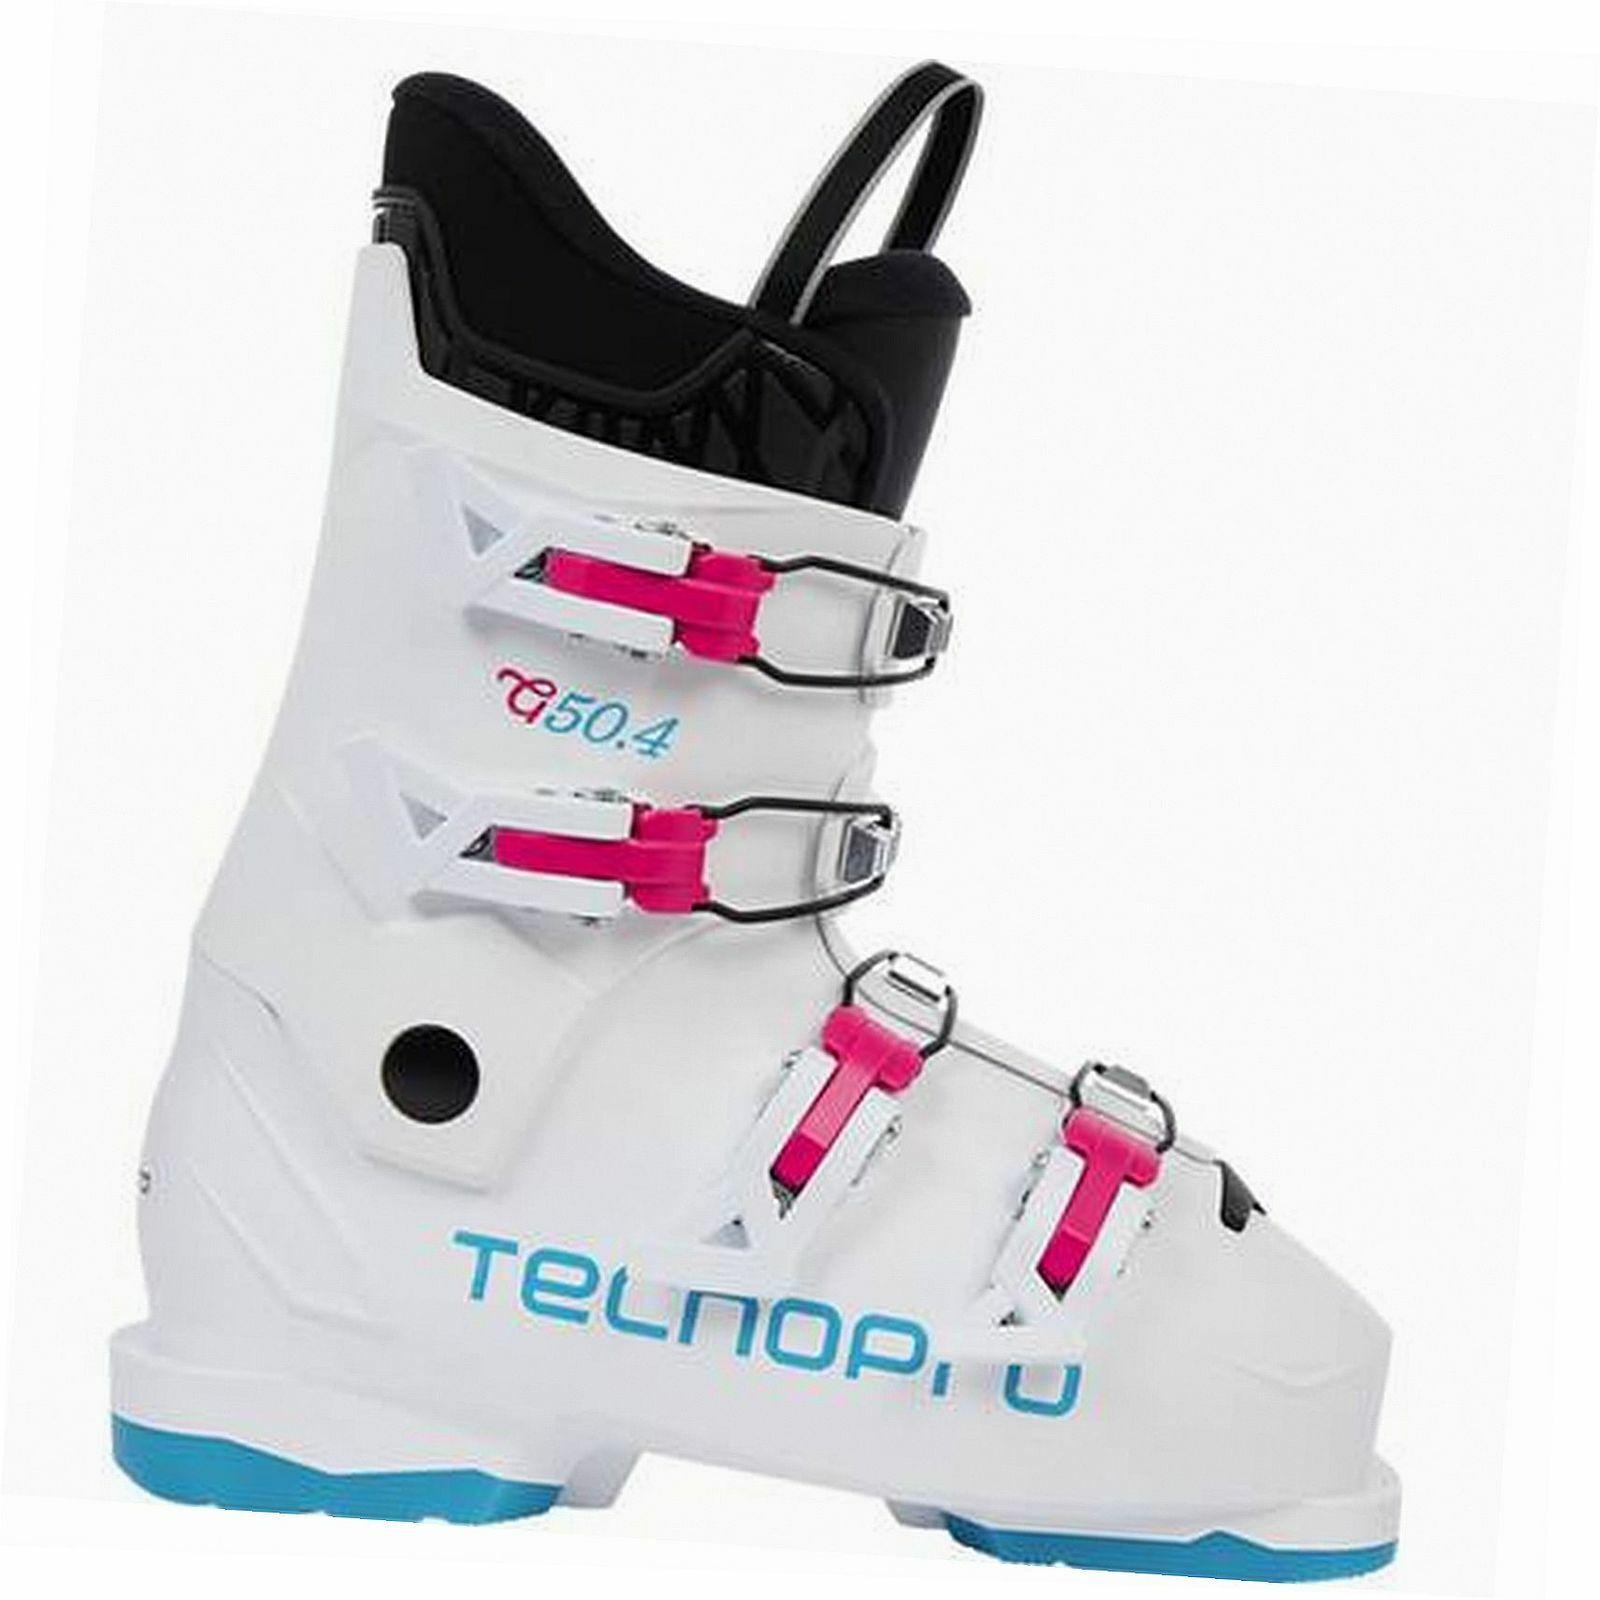 Tecno pro alpine skischoenen meisjes g50.4 sport blauw wit